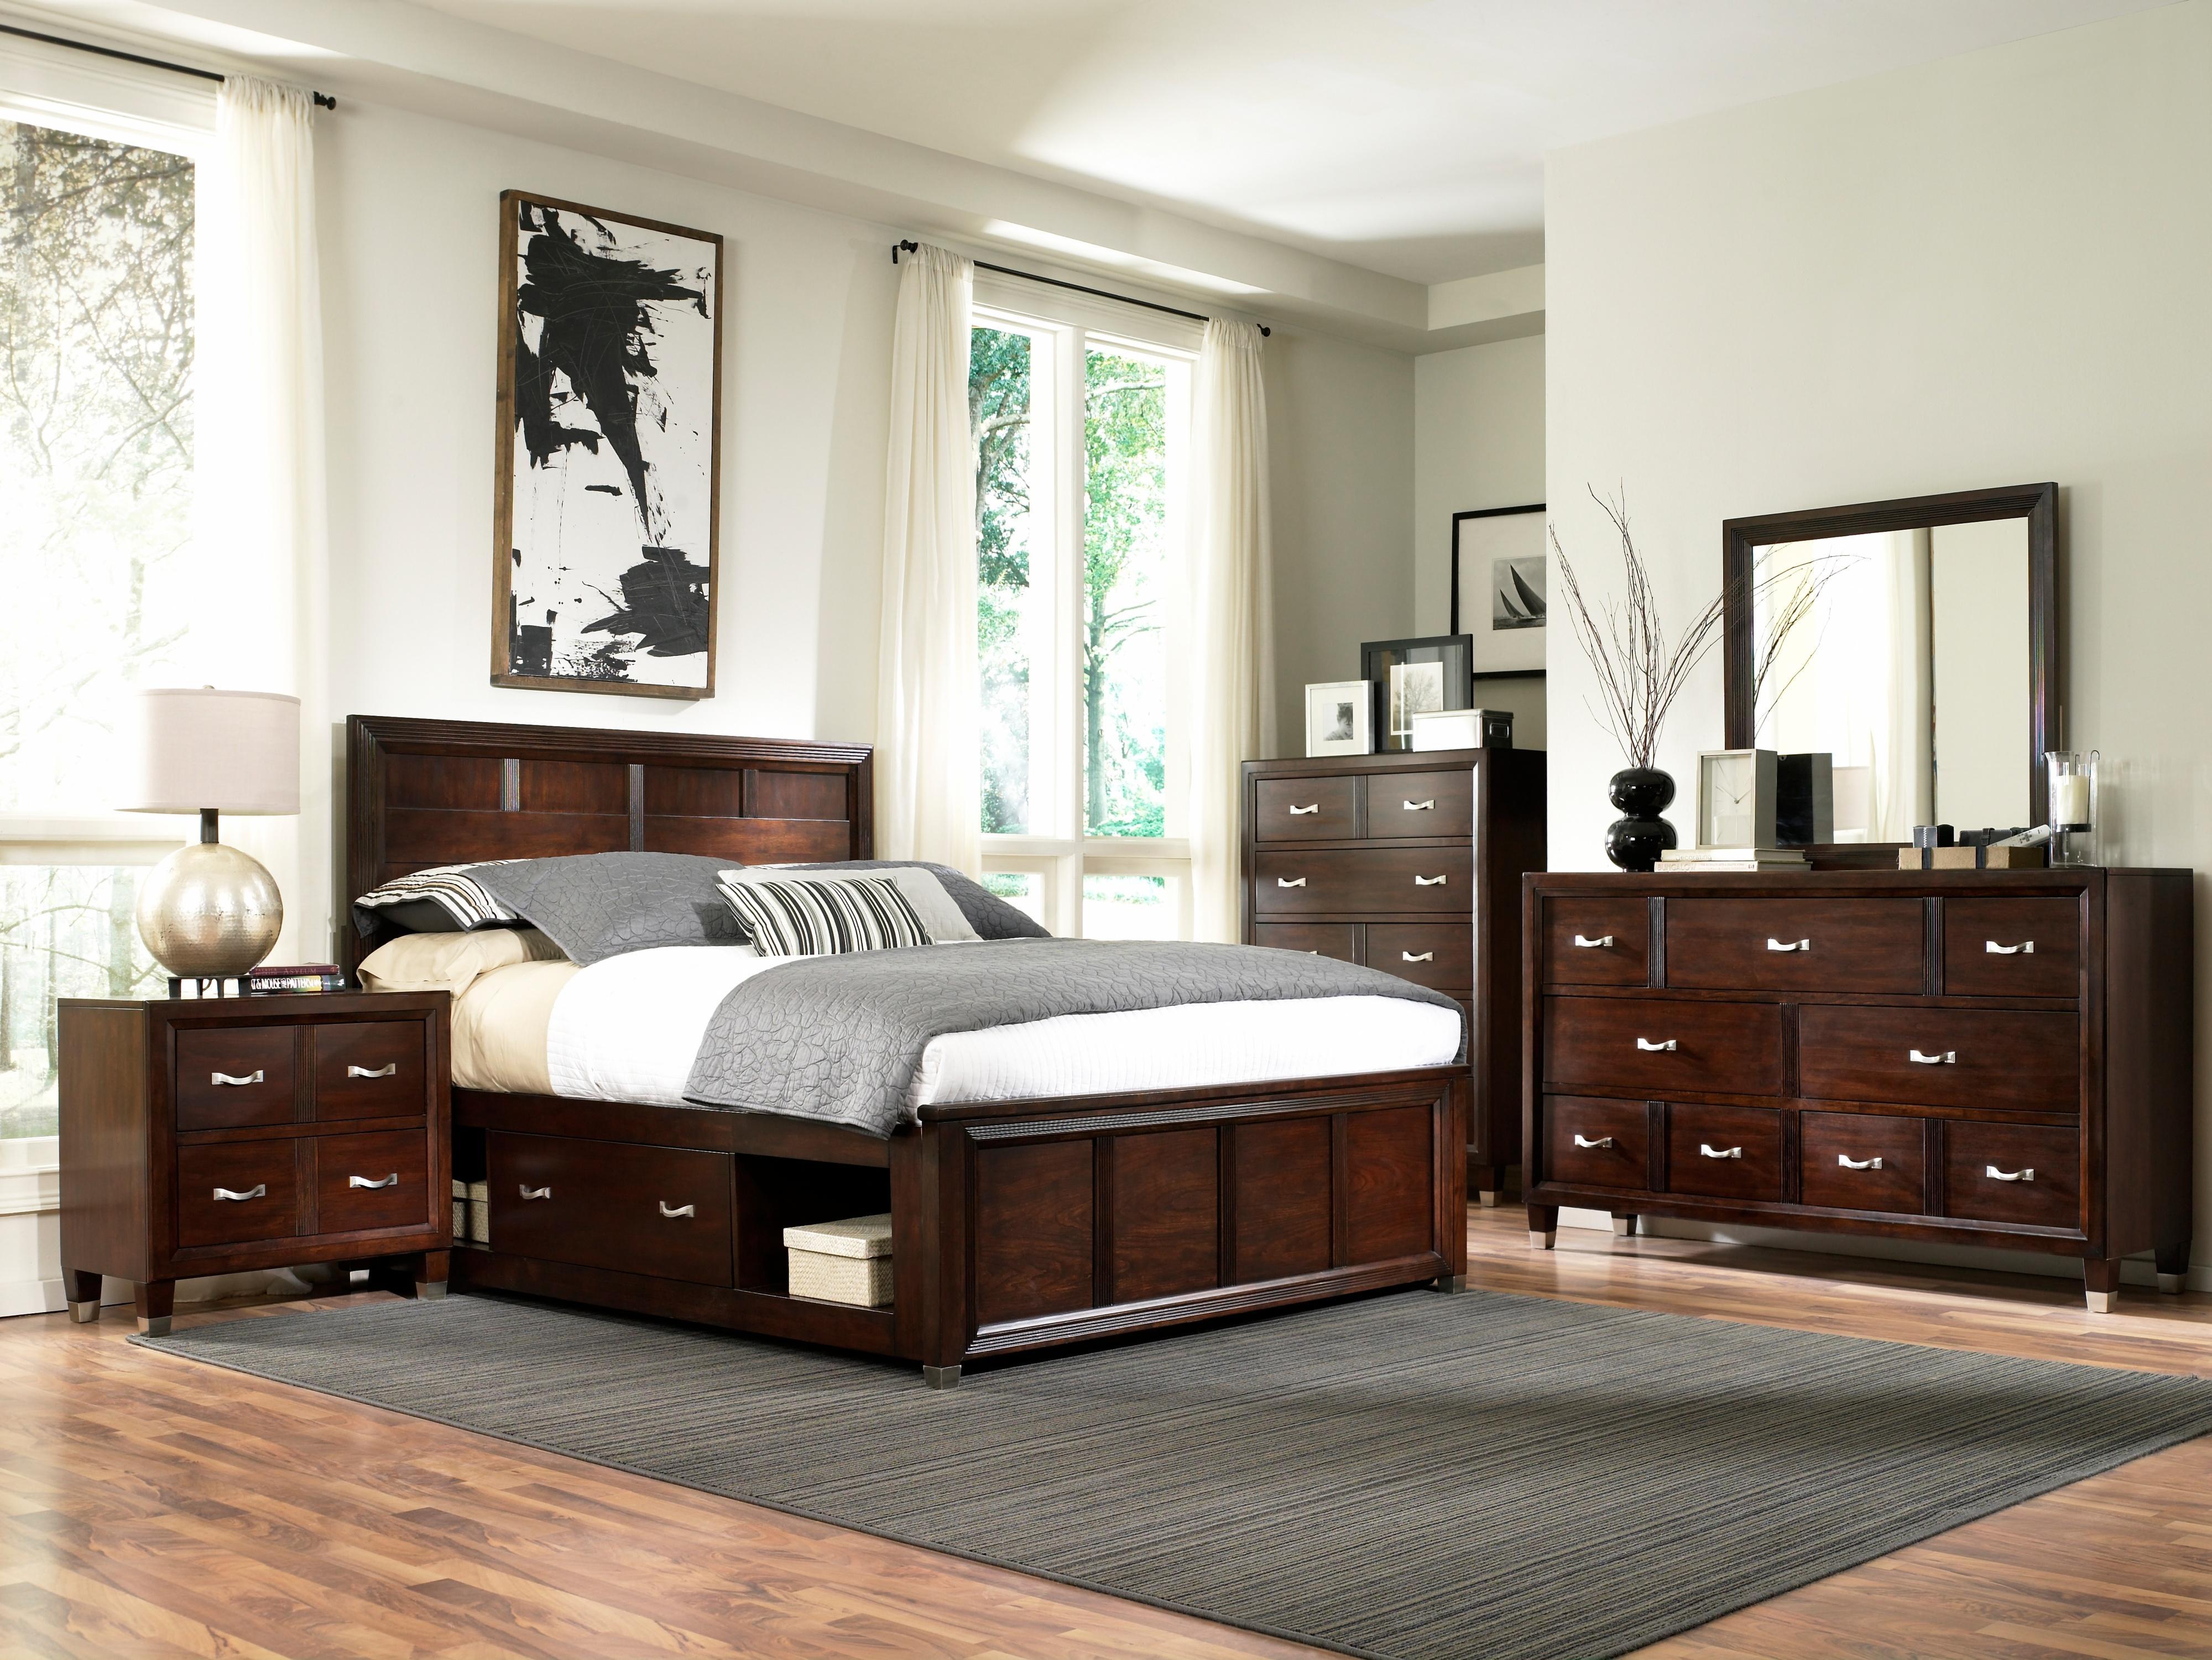 Eastlake 2 4264 by Broyhill Furniture Baer s Furniture